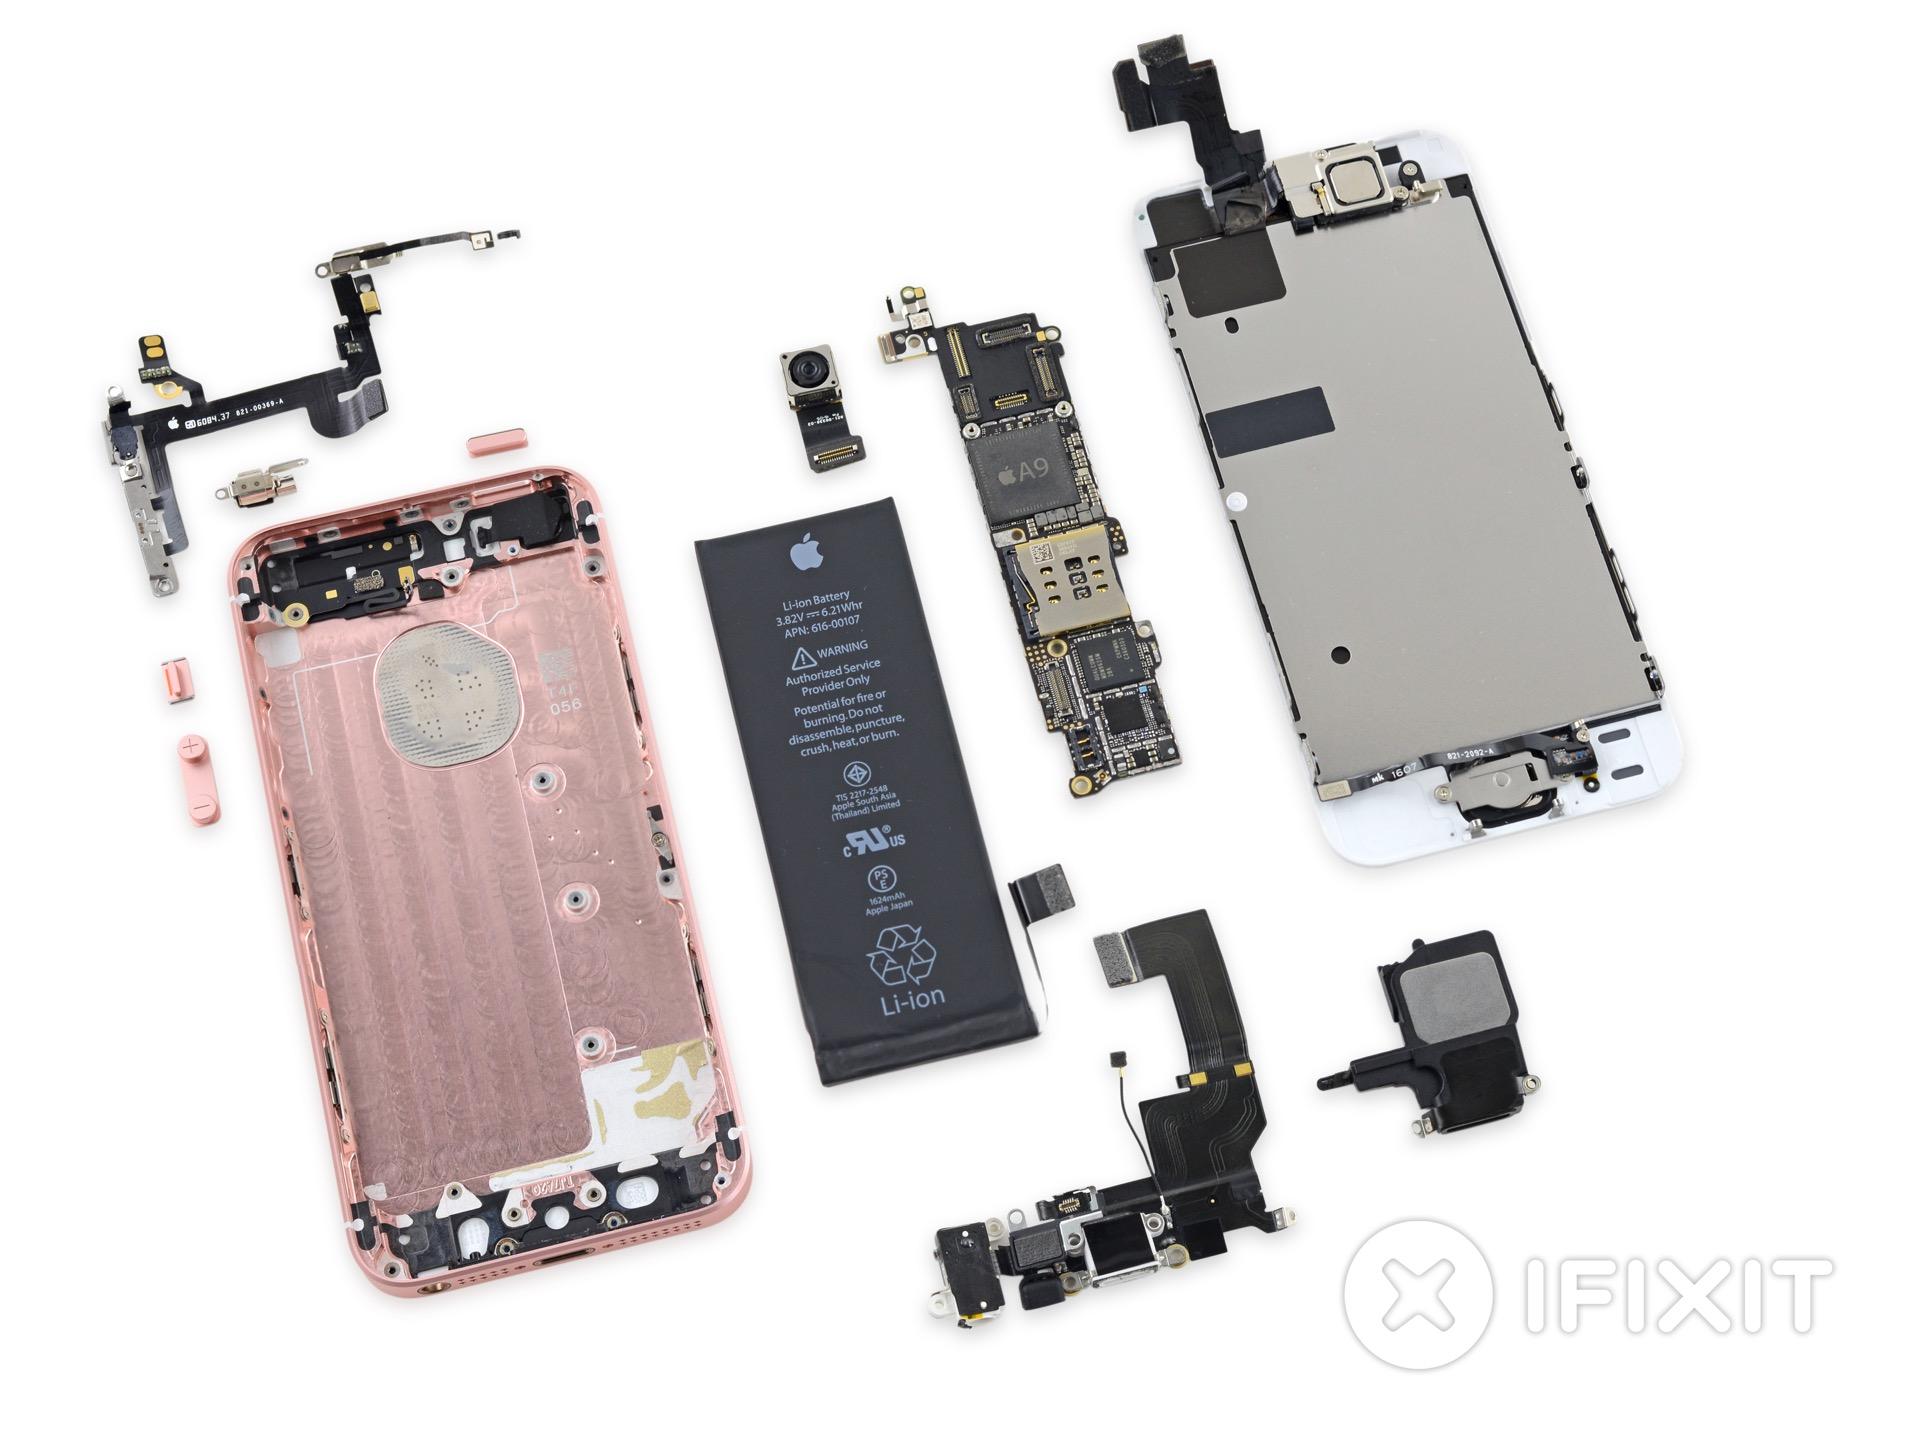 iPhone SE desmontado pela iFixit